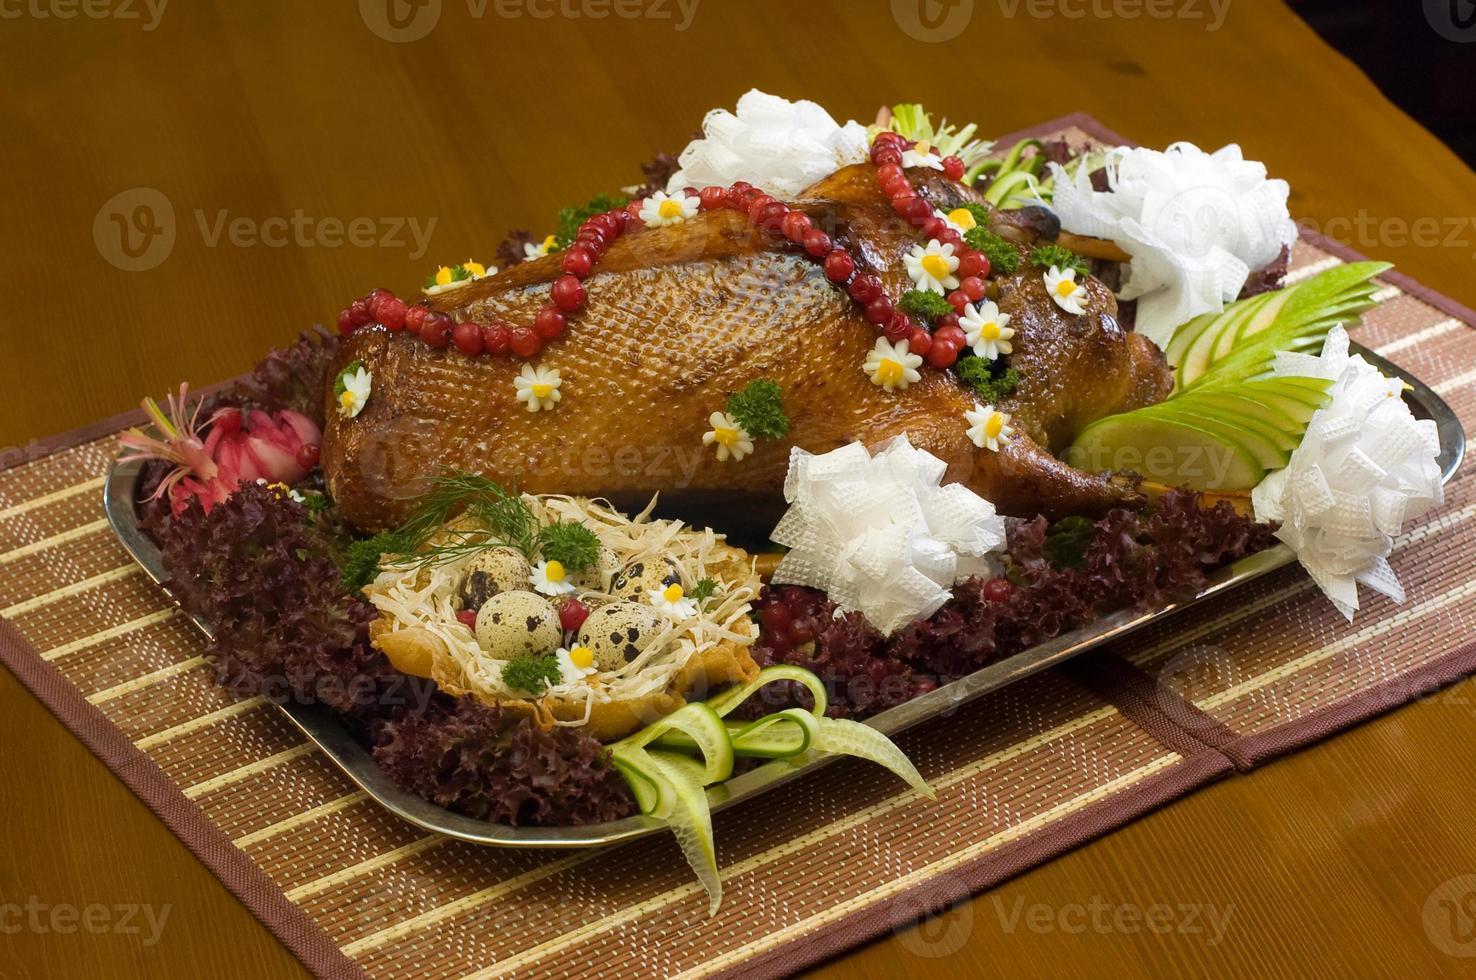 plat avec canard rôti et légumes photo